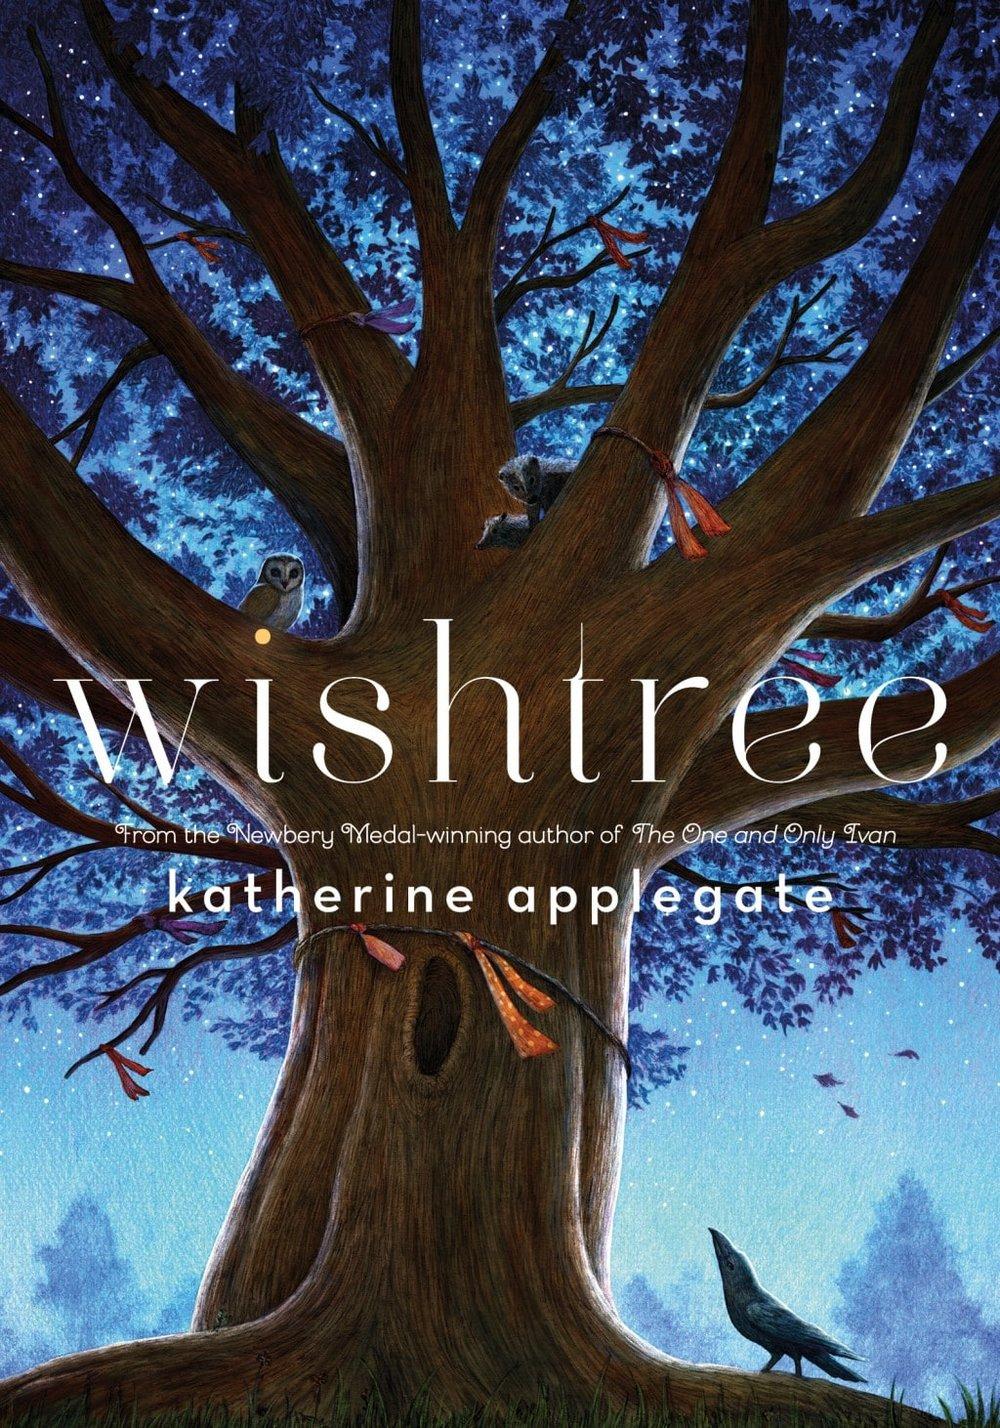 Wishtree, by Katherine Applegate